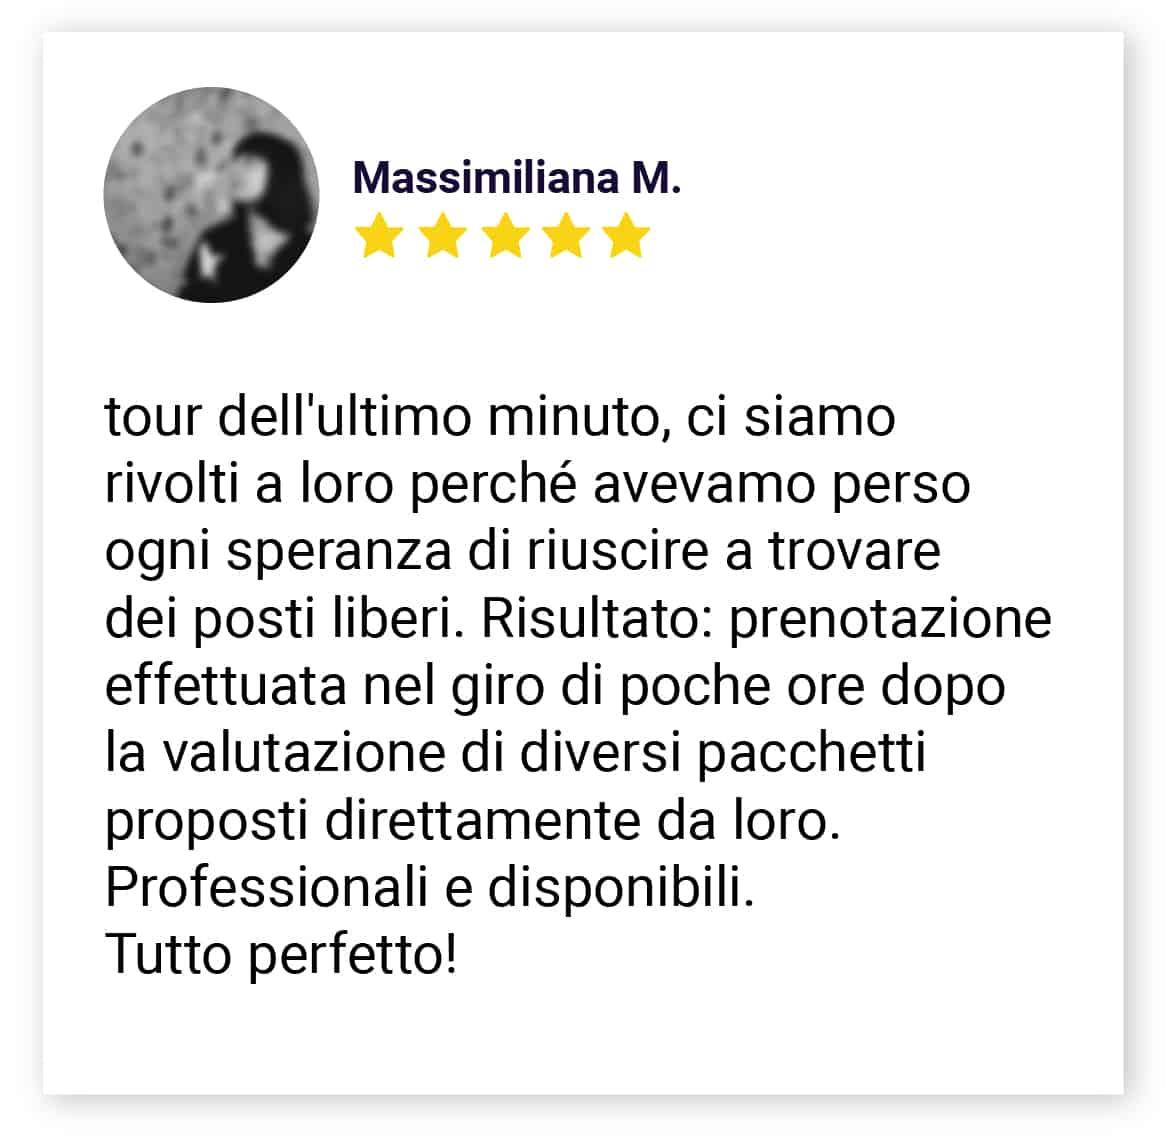 massimiliana m